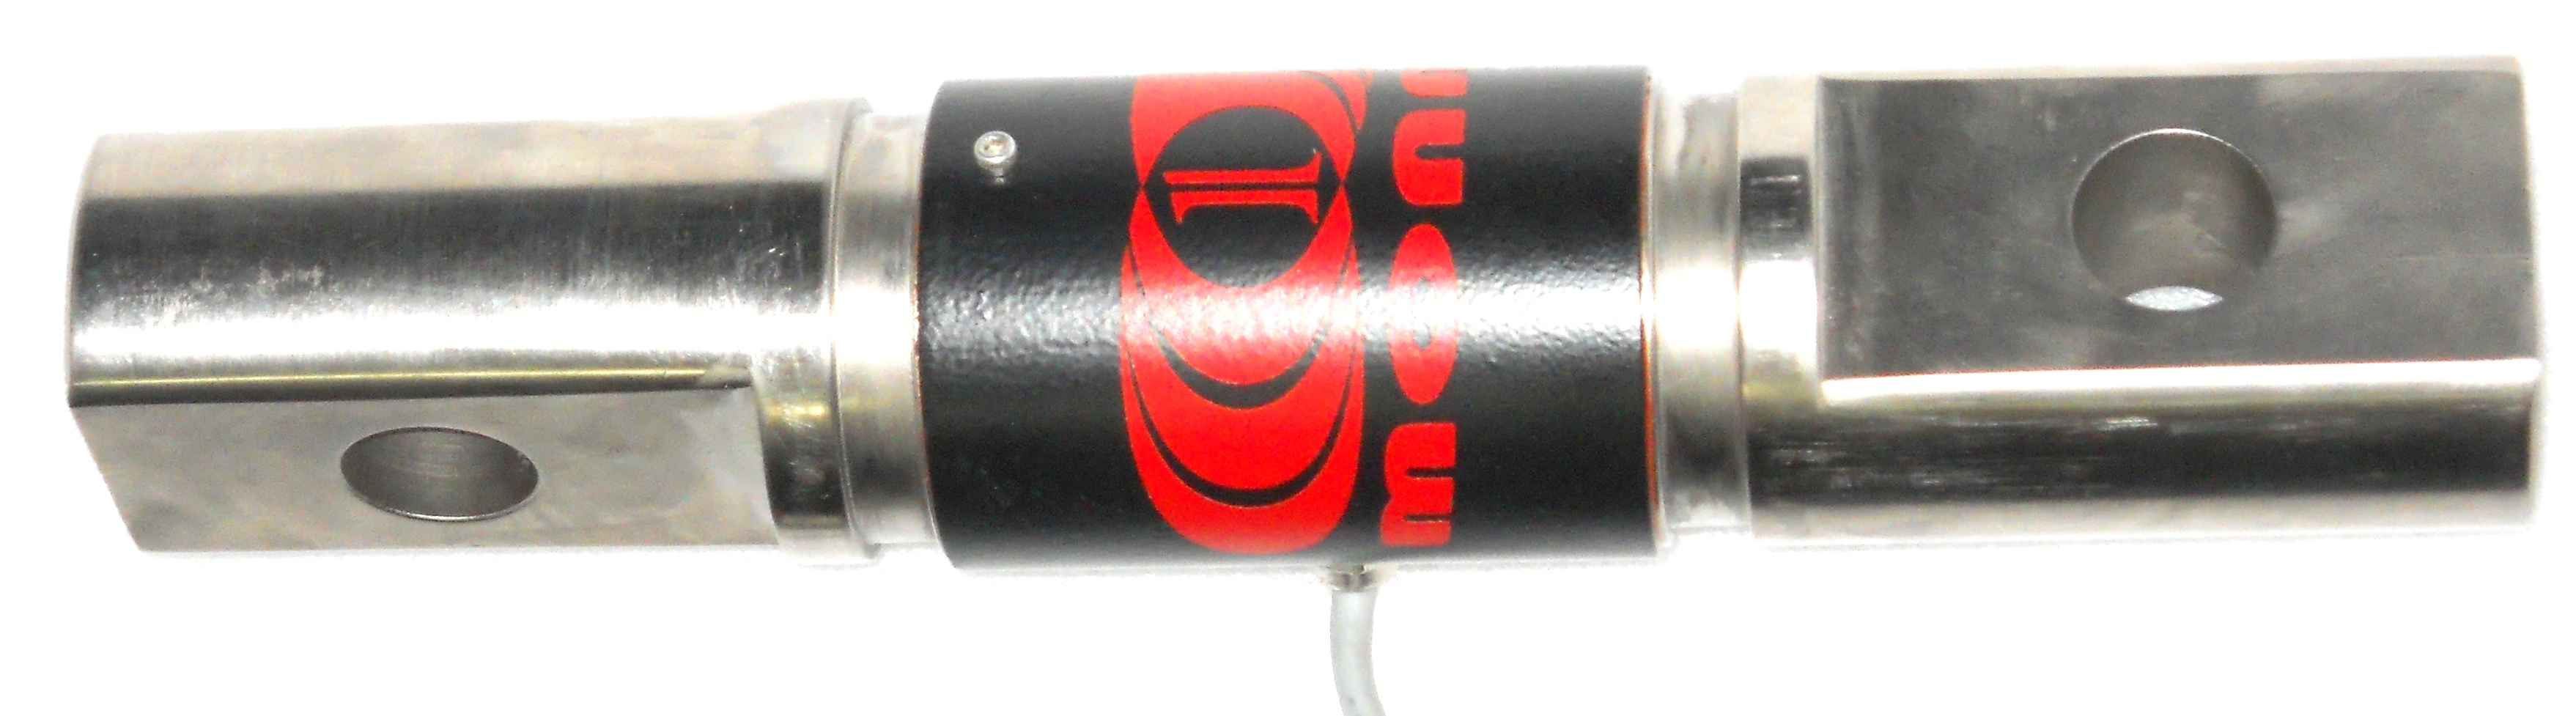 Digital Tension Dynamometer